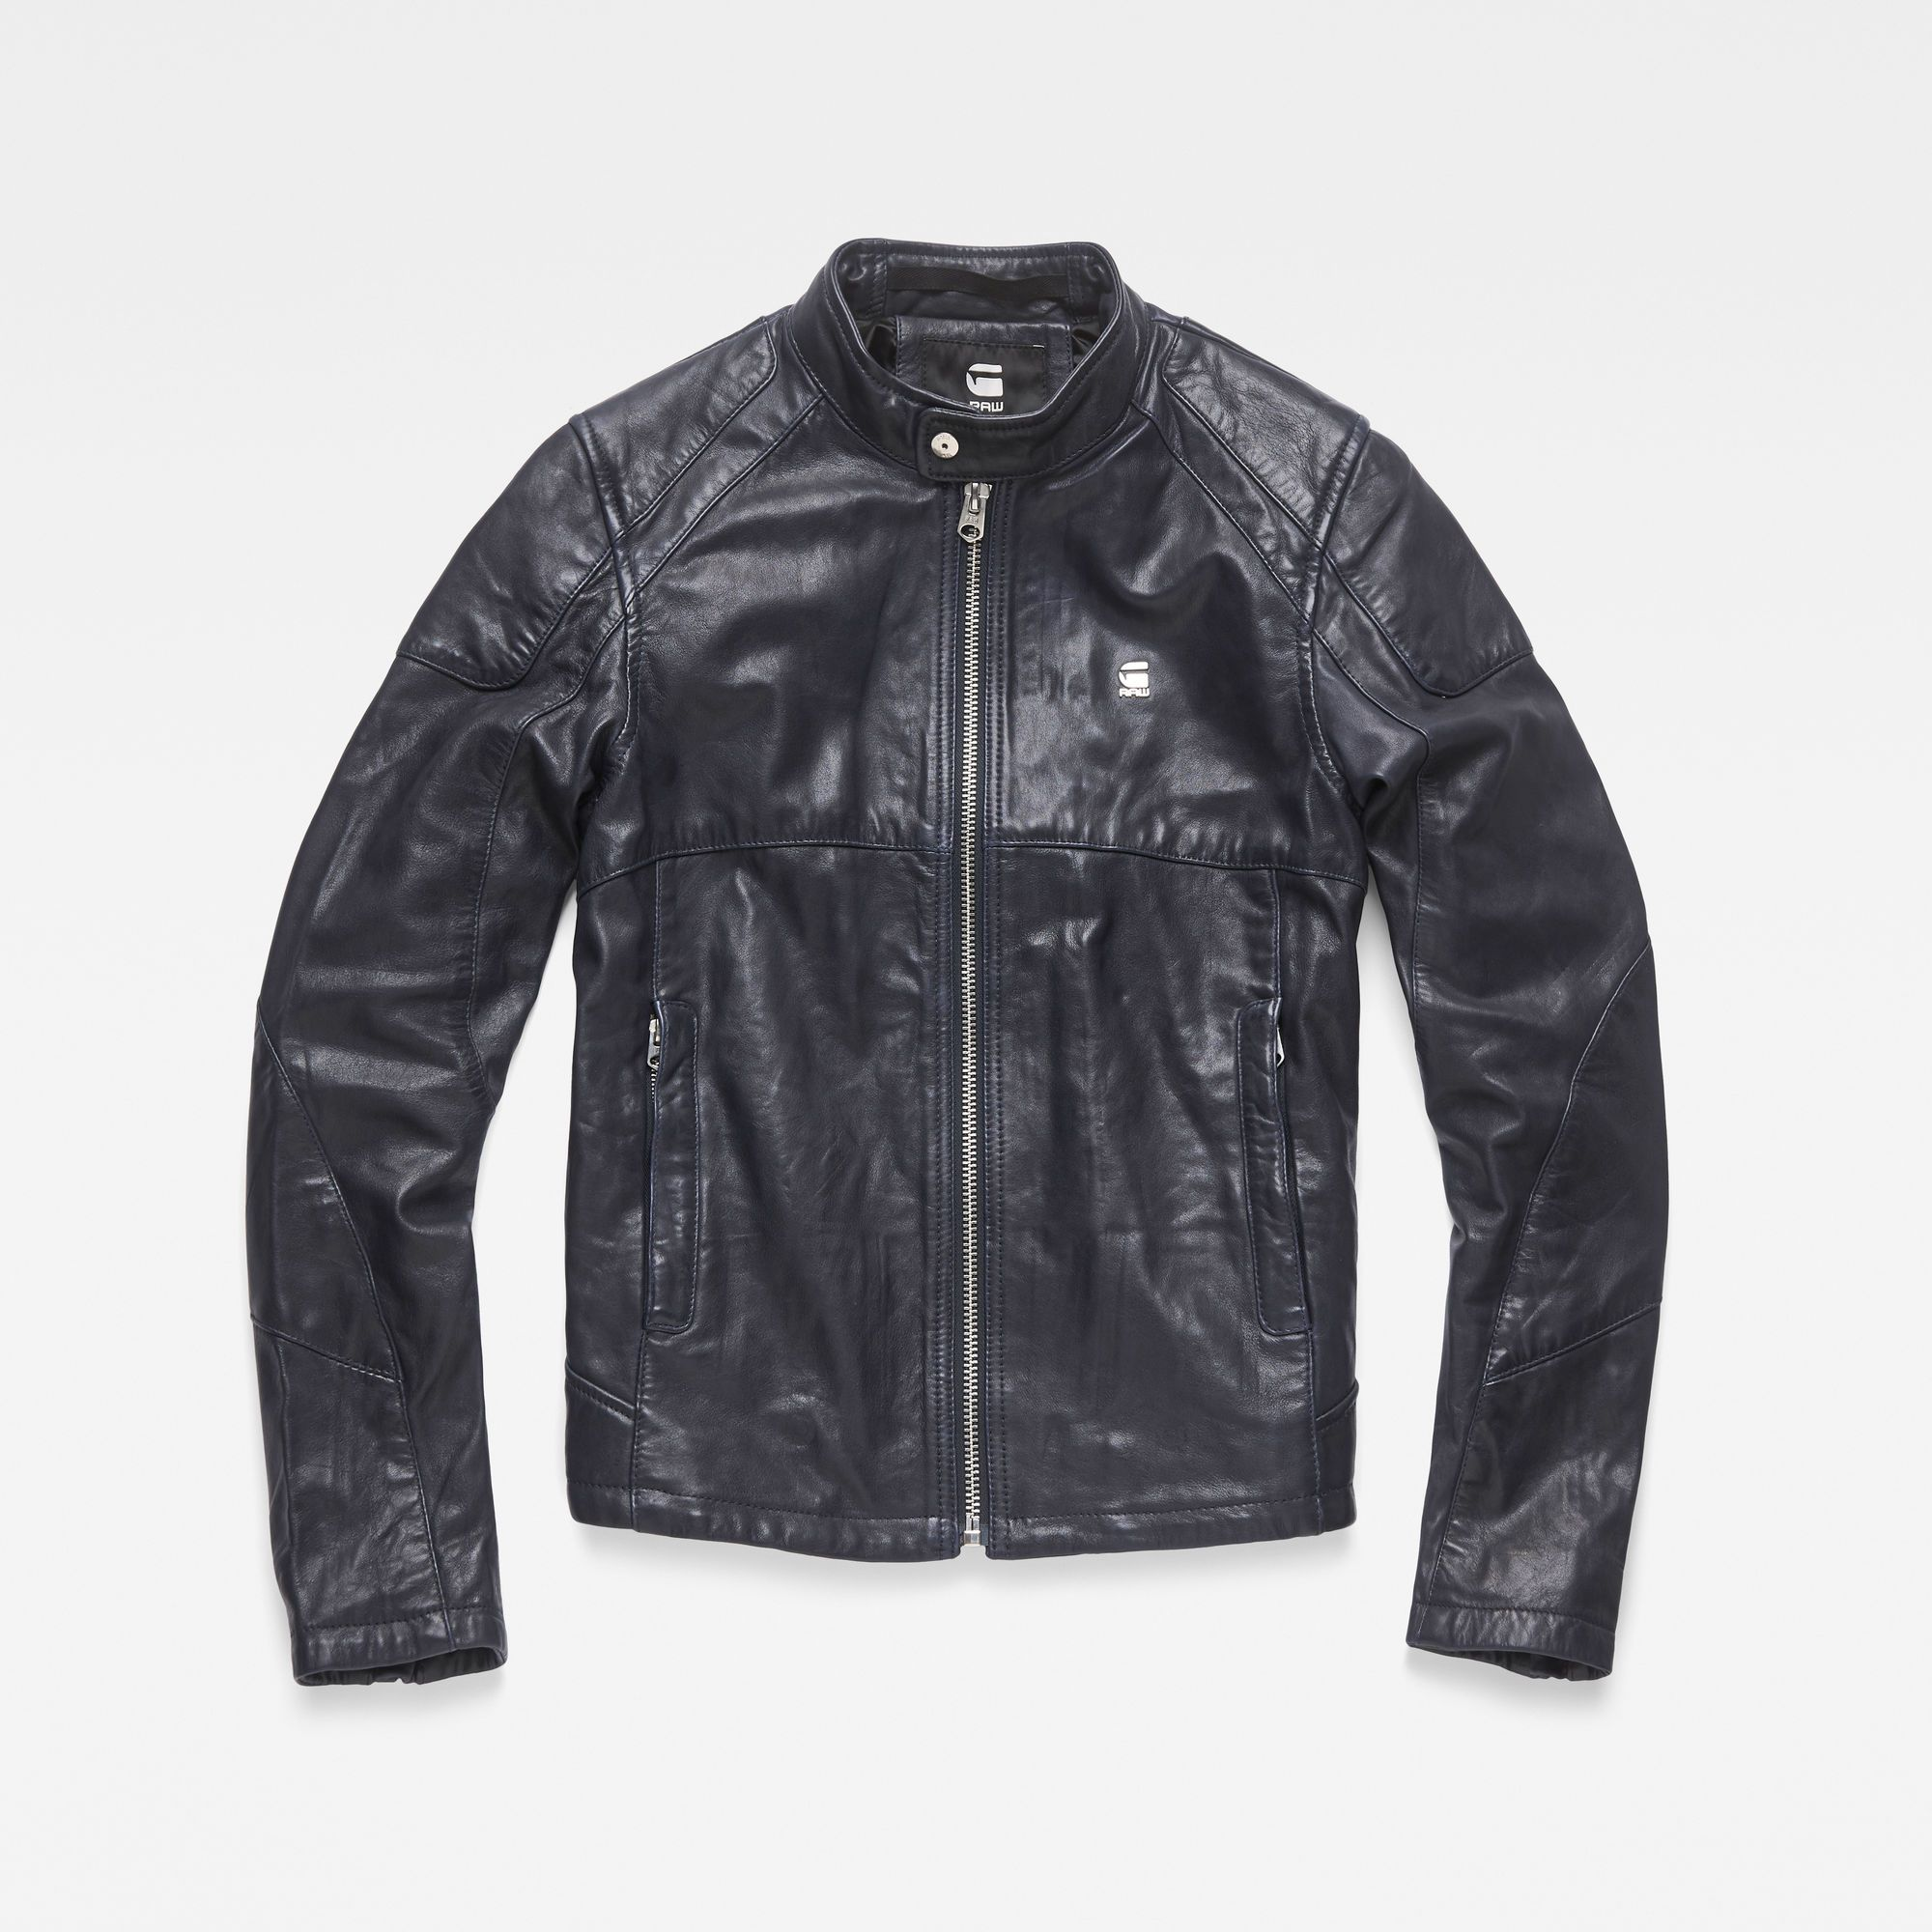 Motac O Biker Jacket Mazarine Blue G Star Raw Jackets Raw Clothing G Star [ 2000 x 2000 Pixel ]